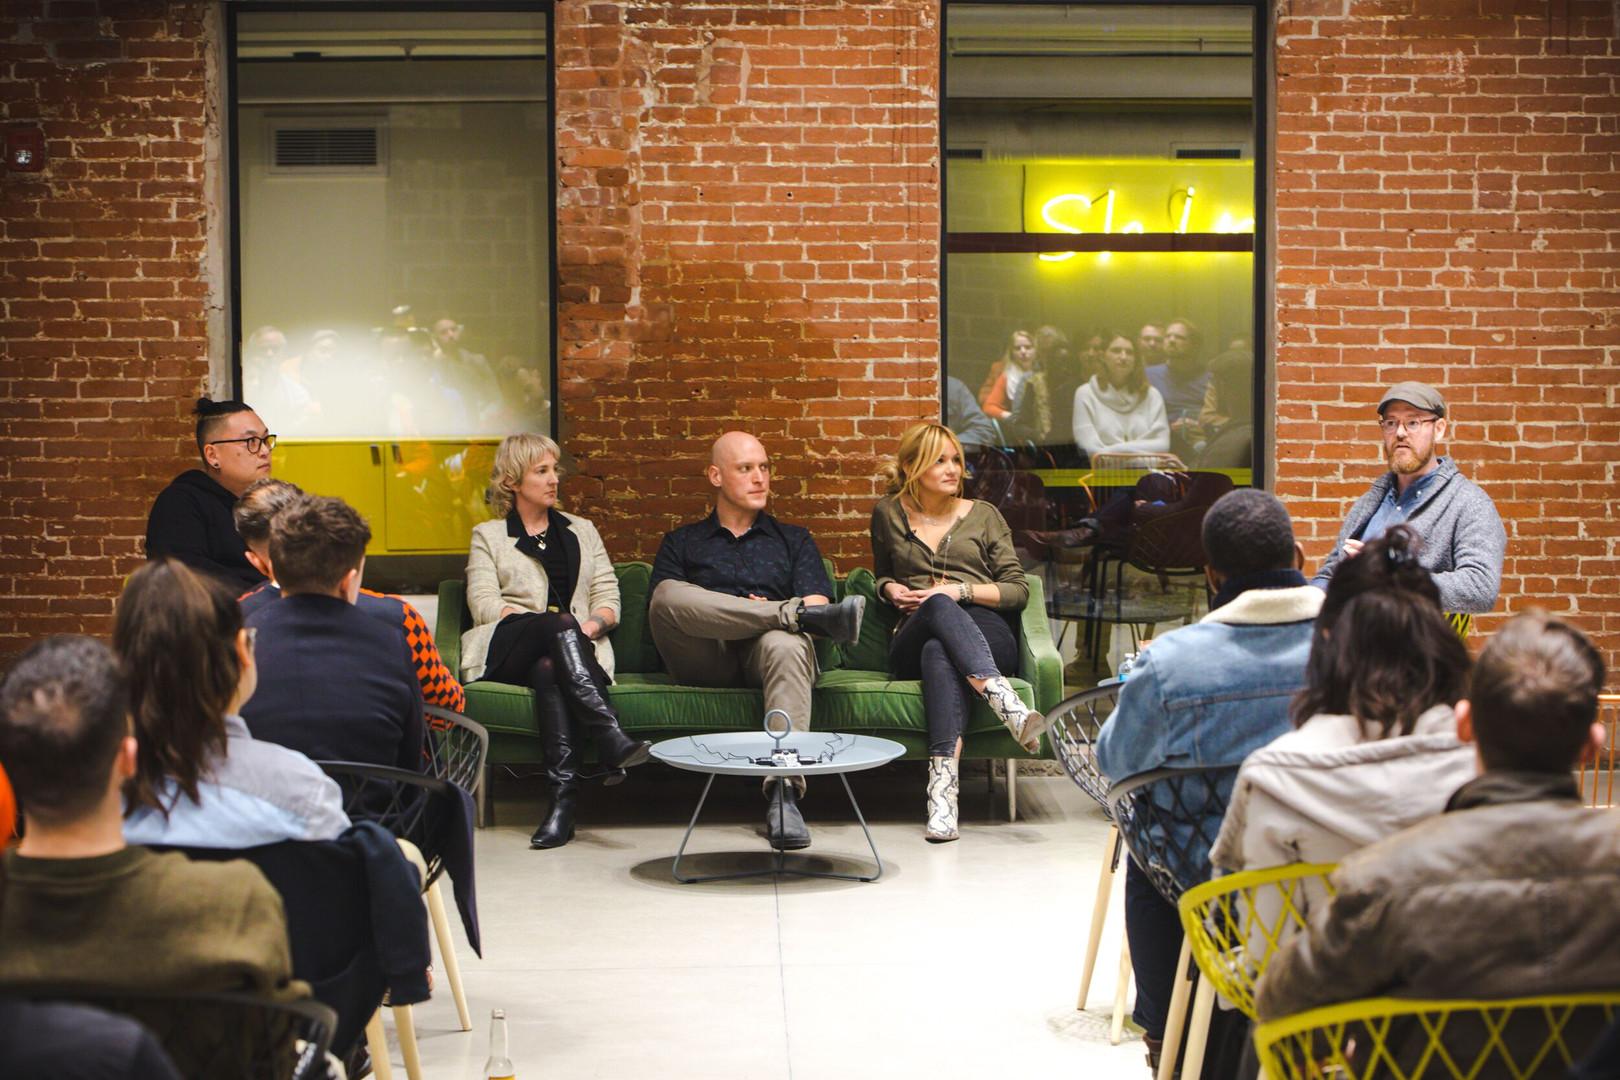 Design Talk by Lynx Design Co